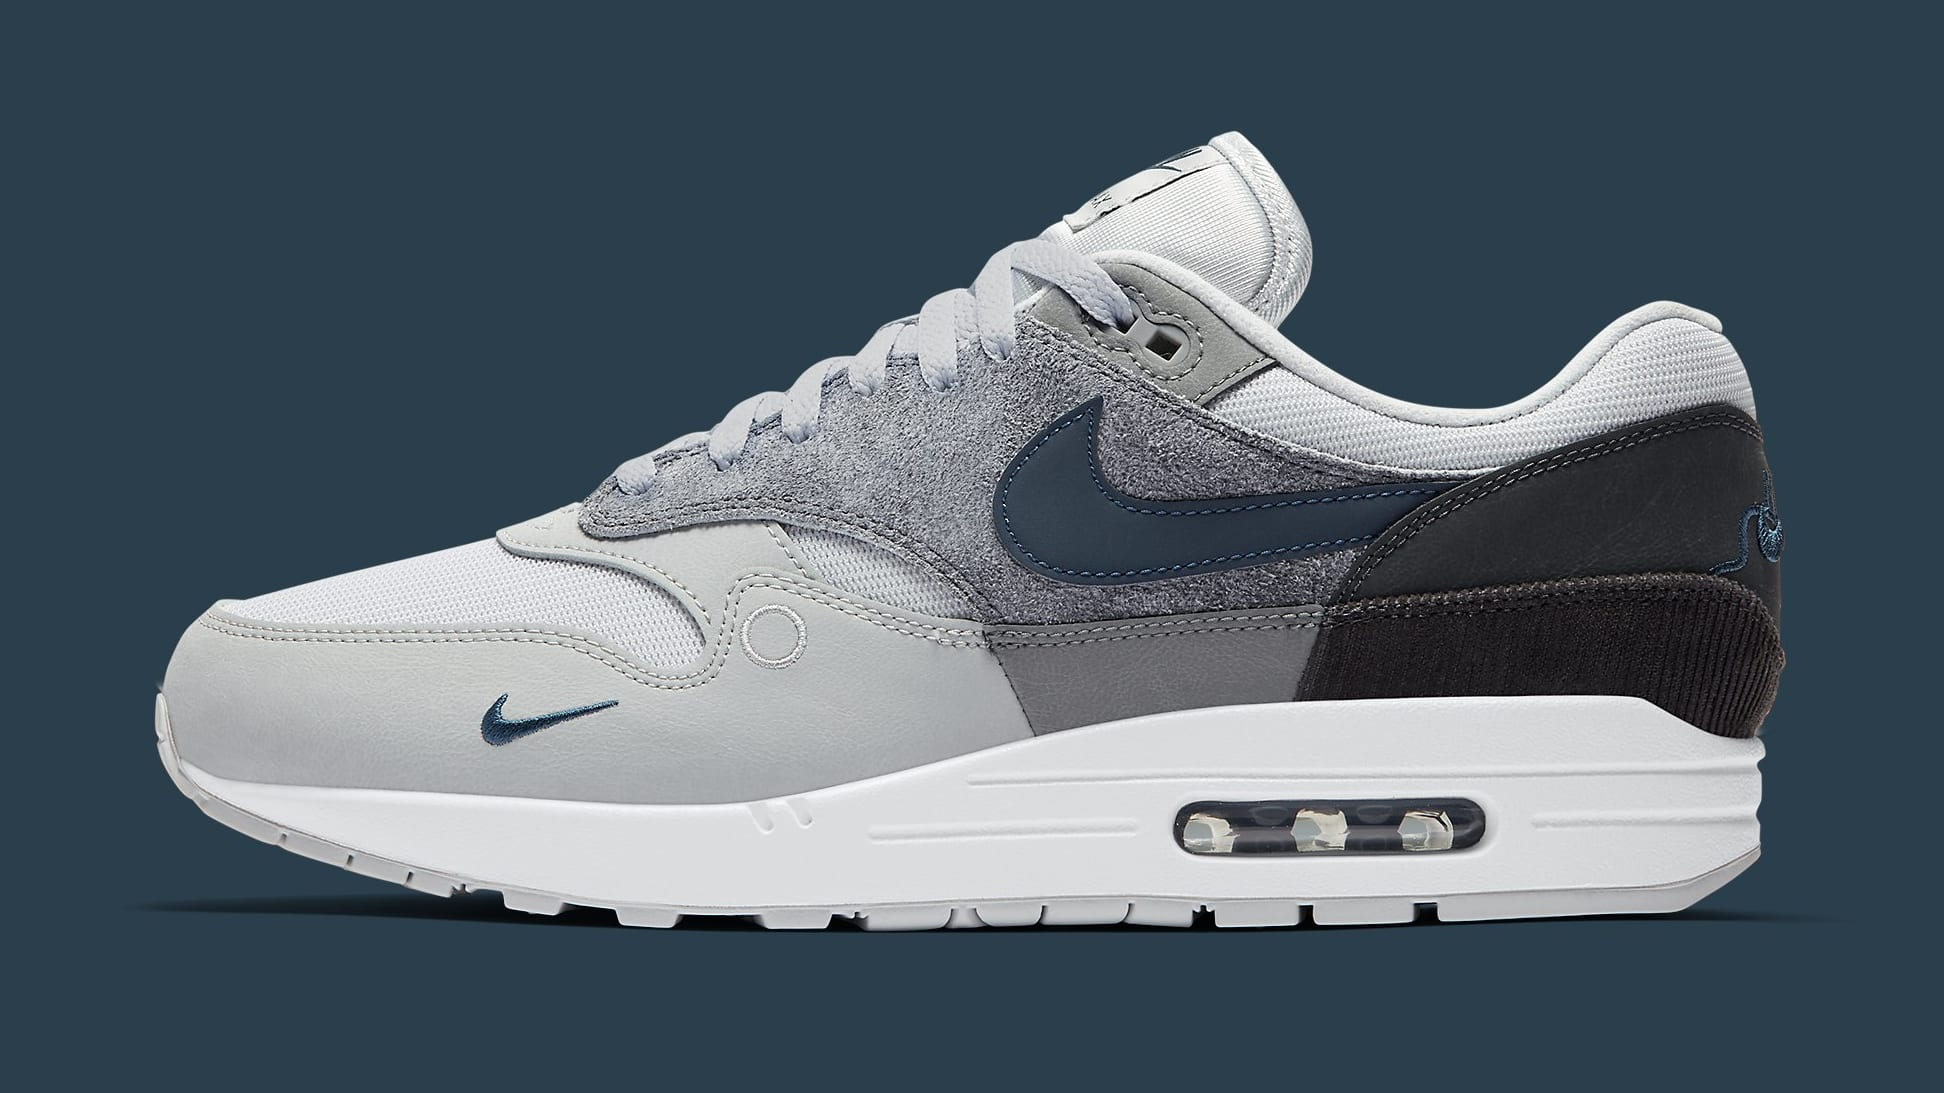 Nike Air Max 1 'City Pack' London CV1639-001 Lateral